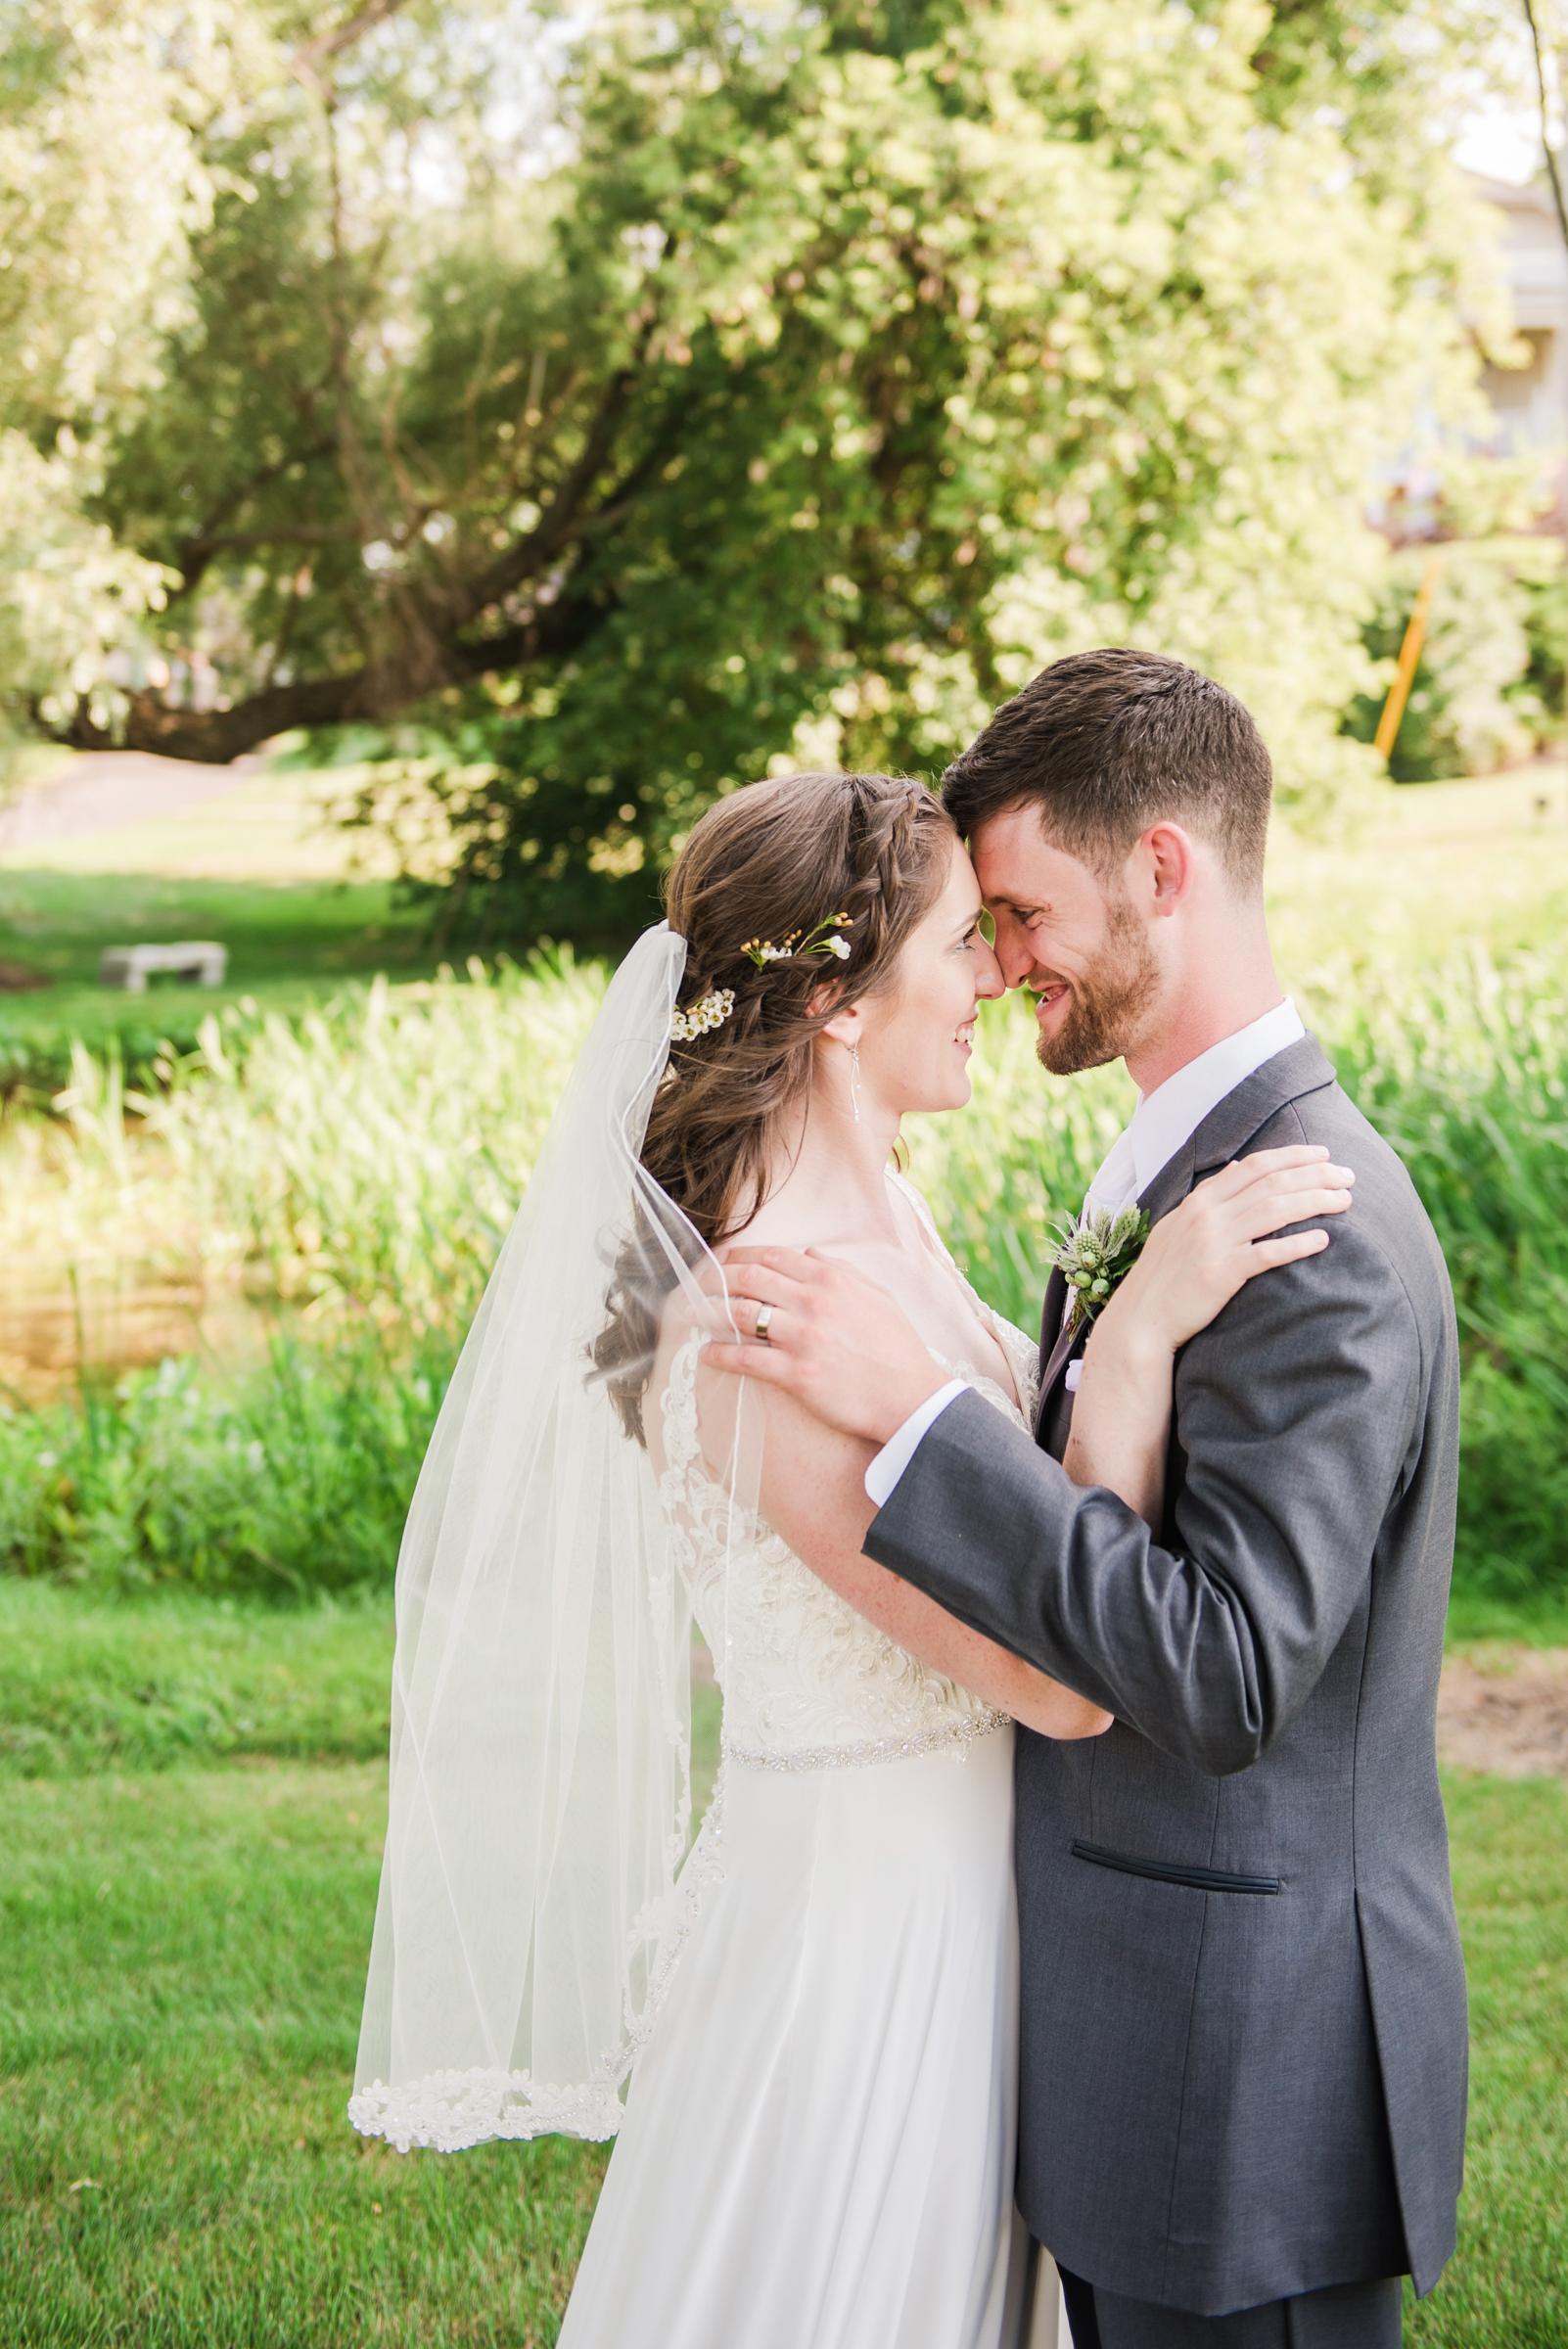 Jerris_Wadsworth_Wedding_Barn_Rochester_Wedding_JILL_STUDIO_Rochester_NY_Photographer_DSC_2772.jpg